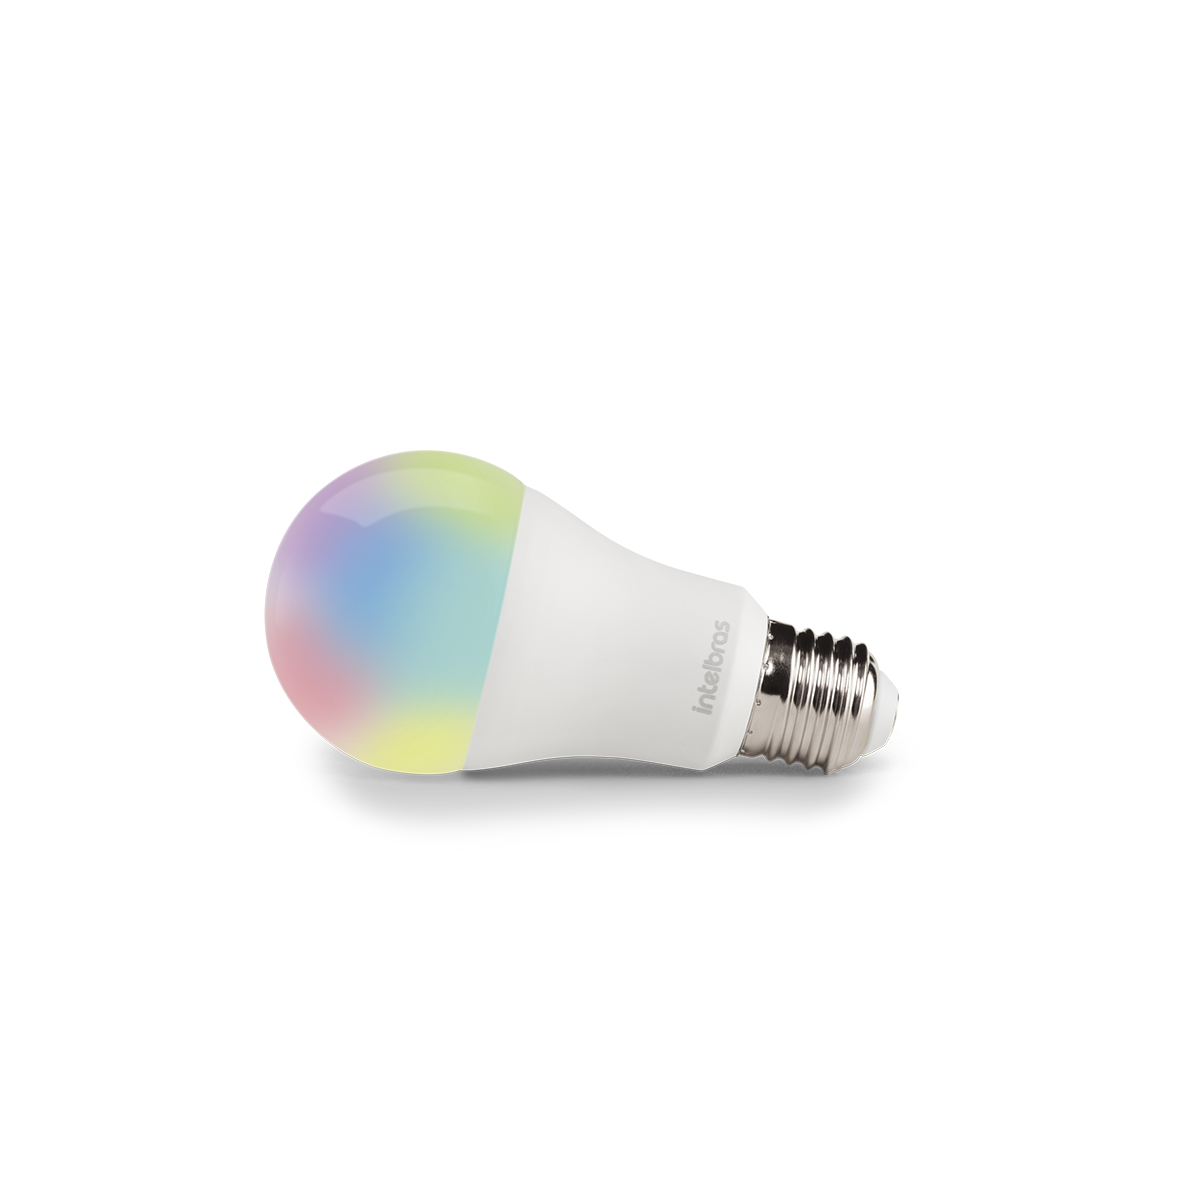 Lâmpada Led Wifi Smart Ews 409  Intelbras